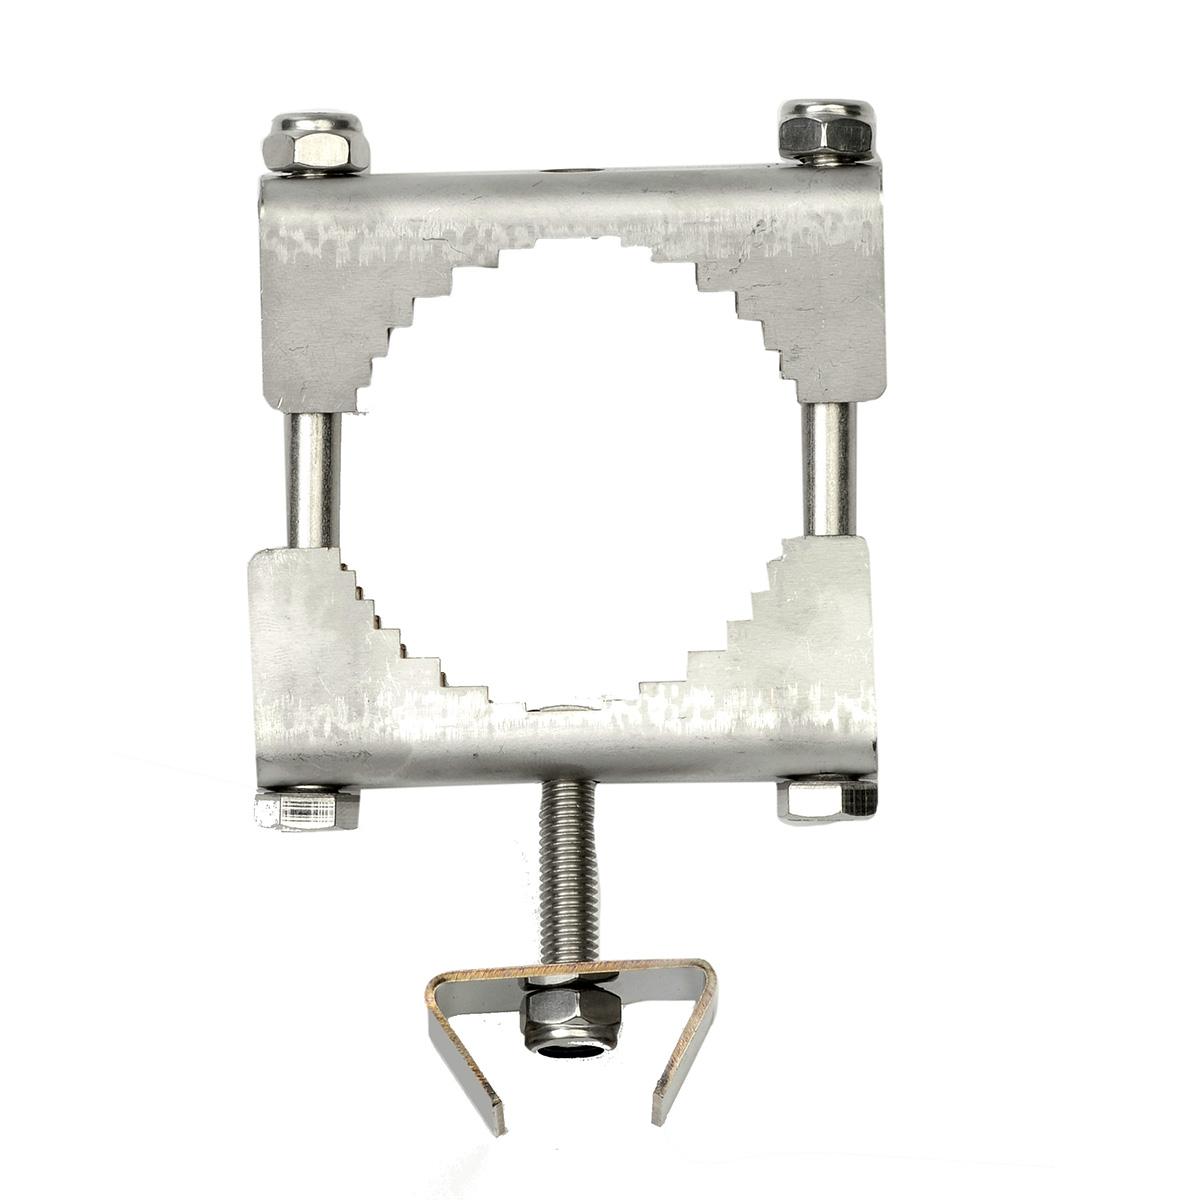 Tolppakiinnike 50-60 mm tolpalle, RST